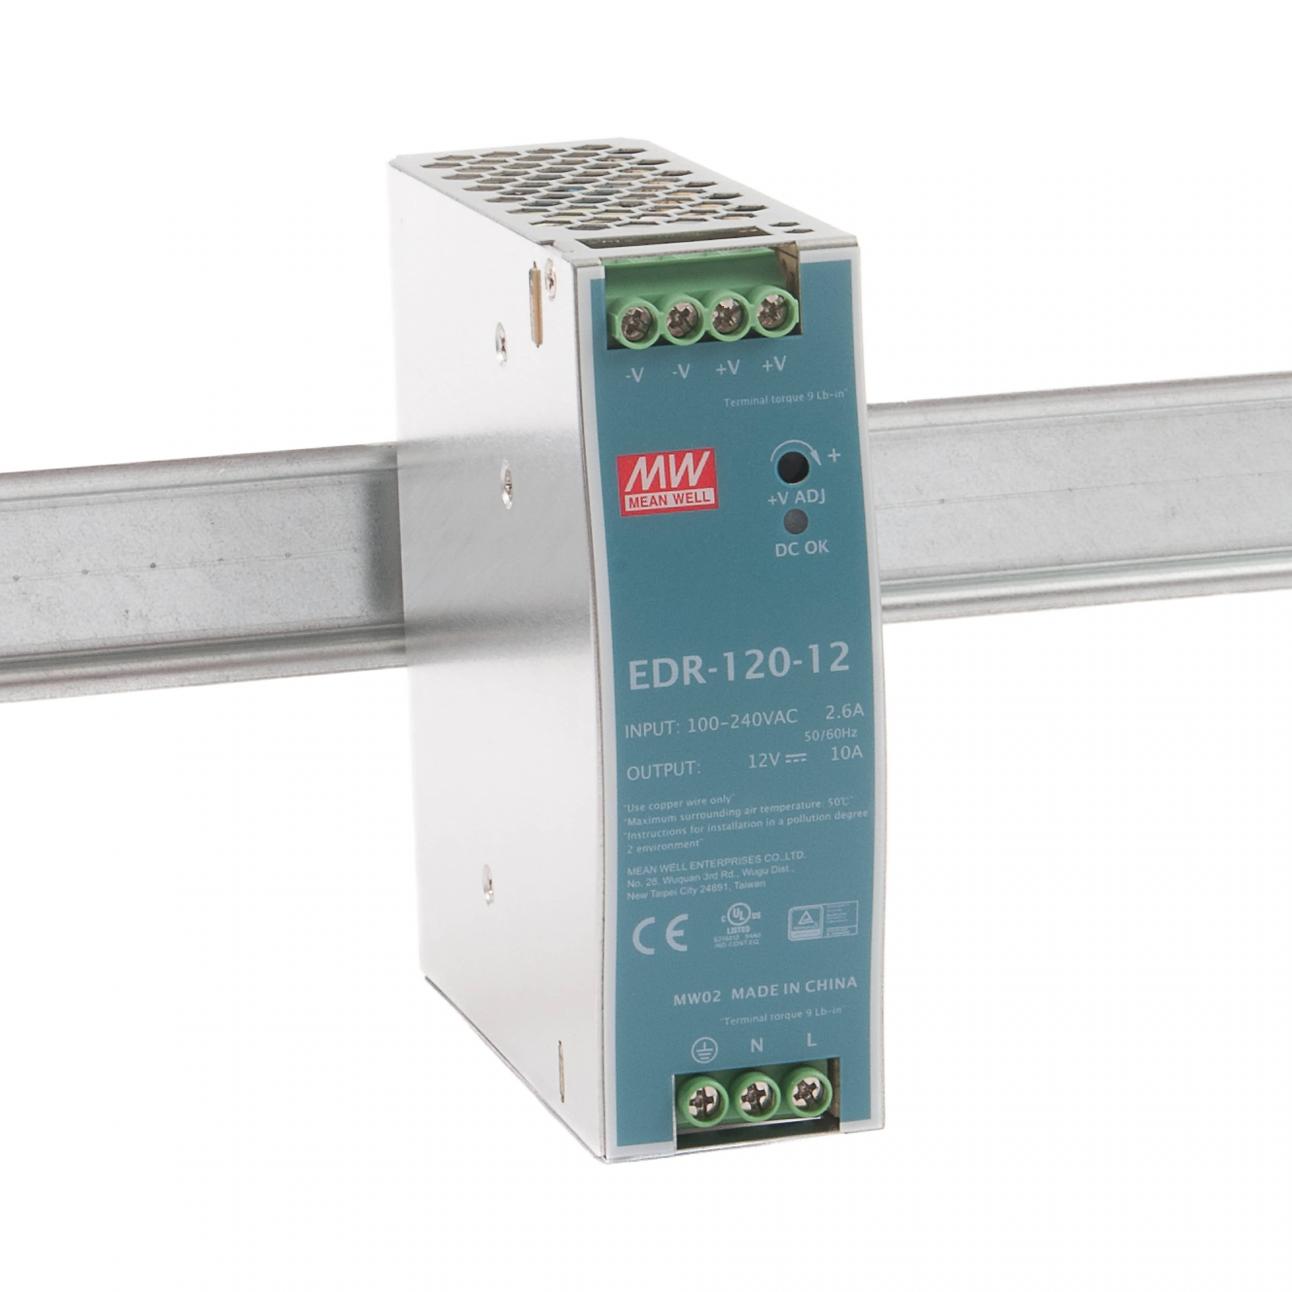 EDR-120-12 Блок питания на DIN-рейку, 12В, 10 А, 120Вт Mean Well